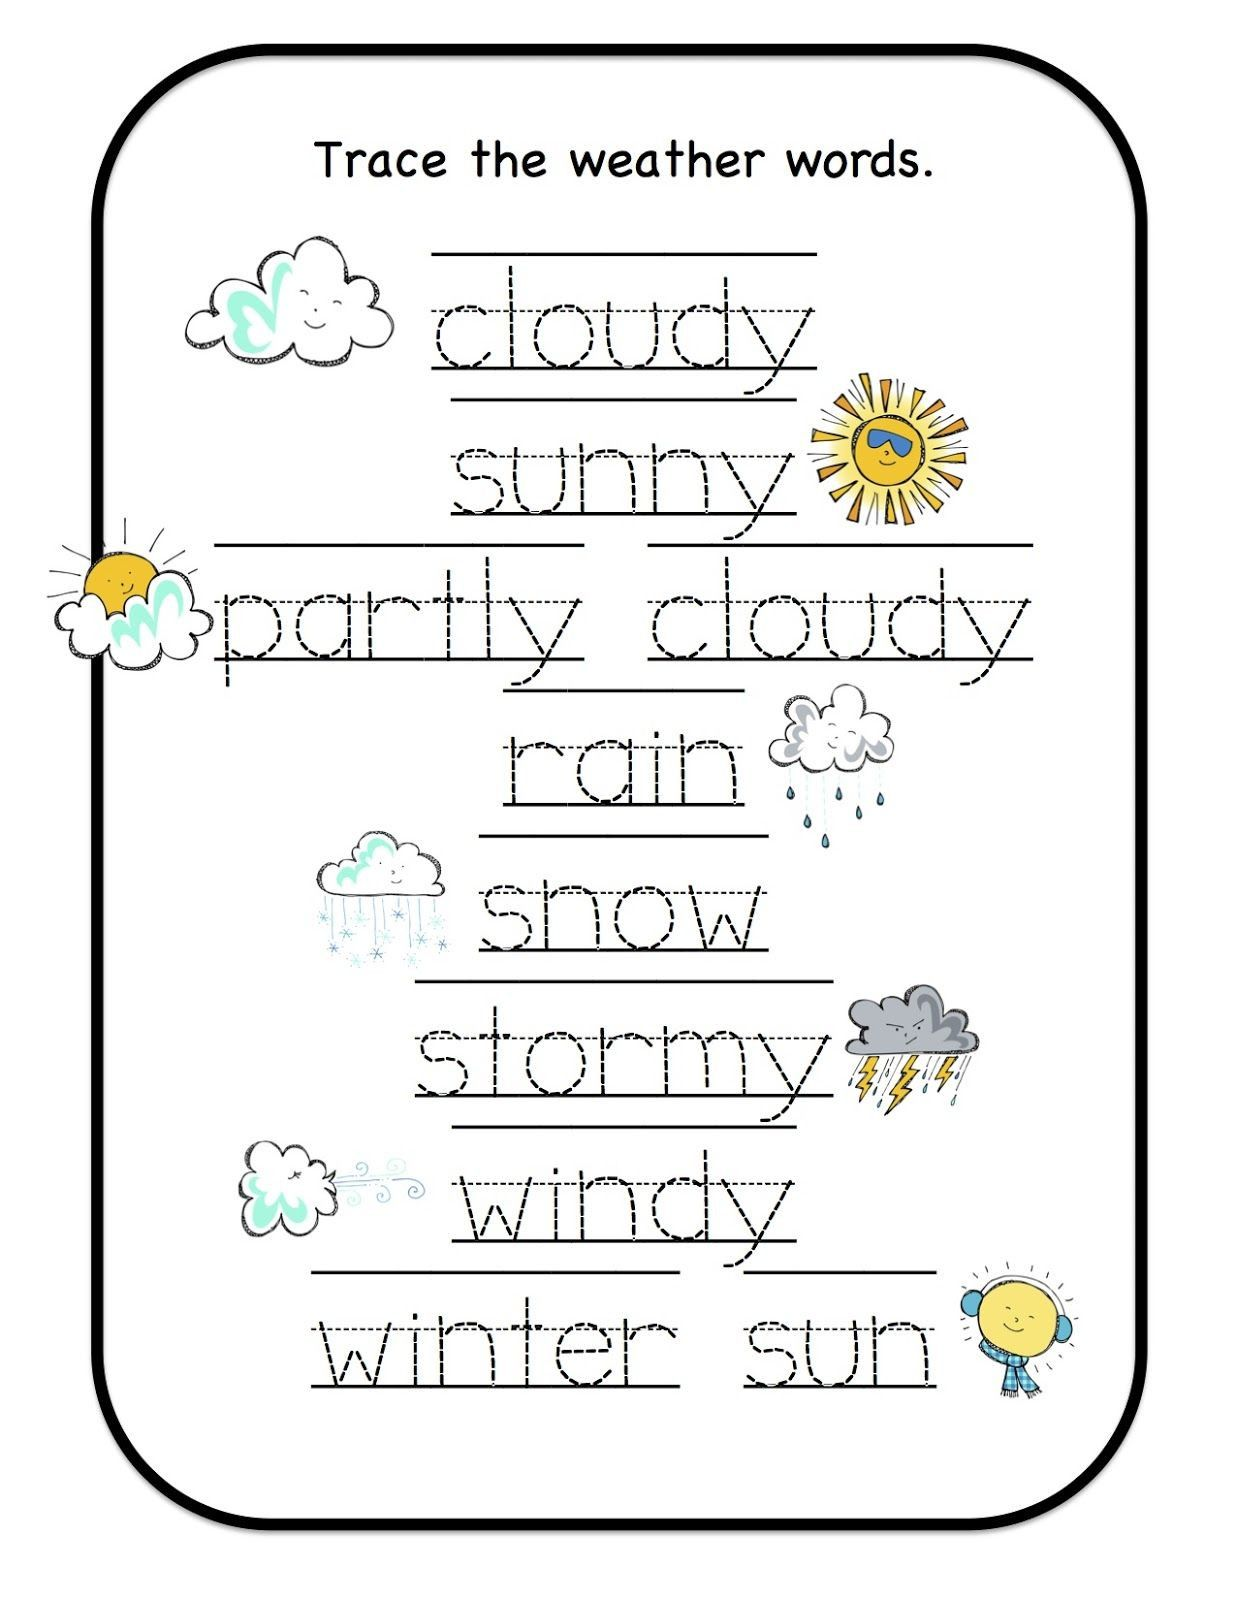 Labeling Worksheets For Kindergarten Worksheet For Kindergarten Weather Worksheets Teaching Weather Preschool Weather